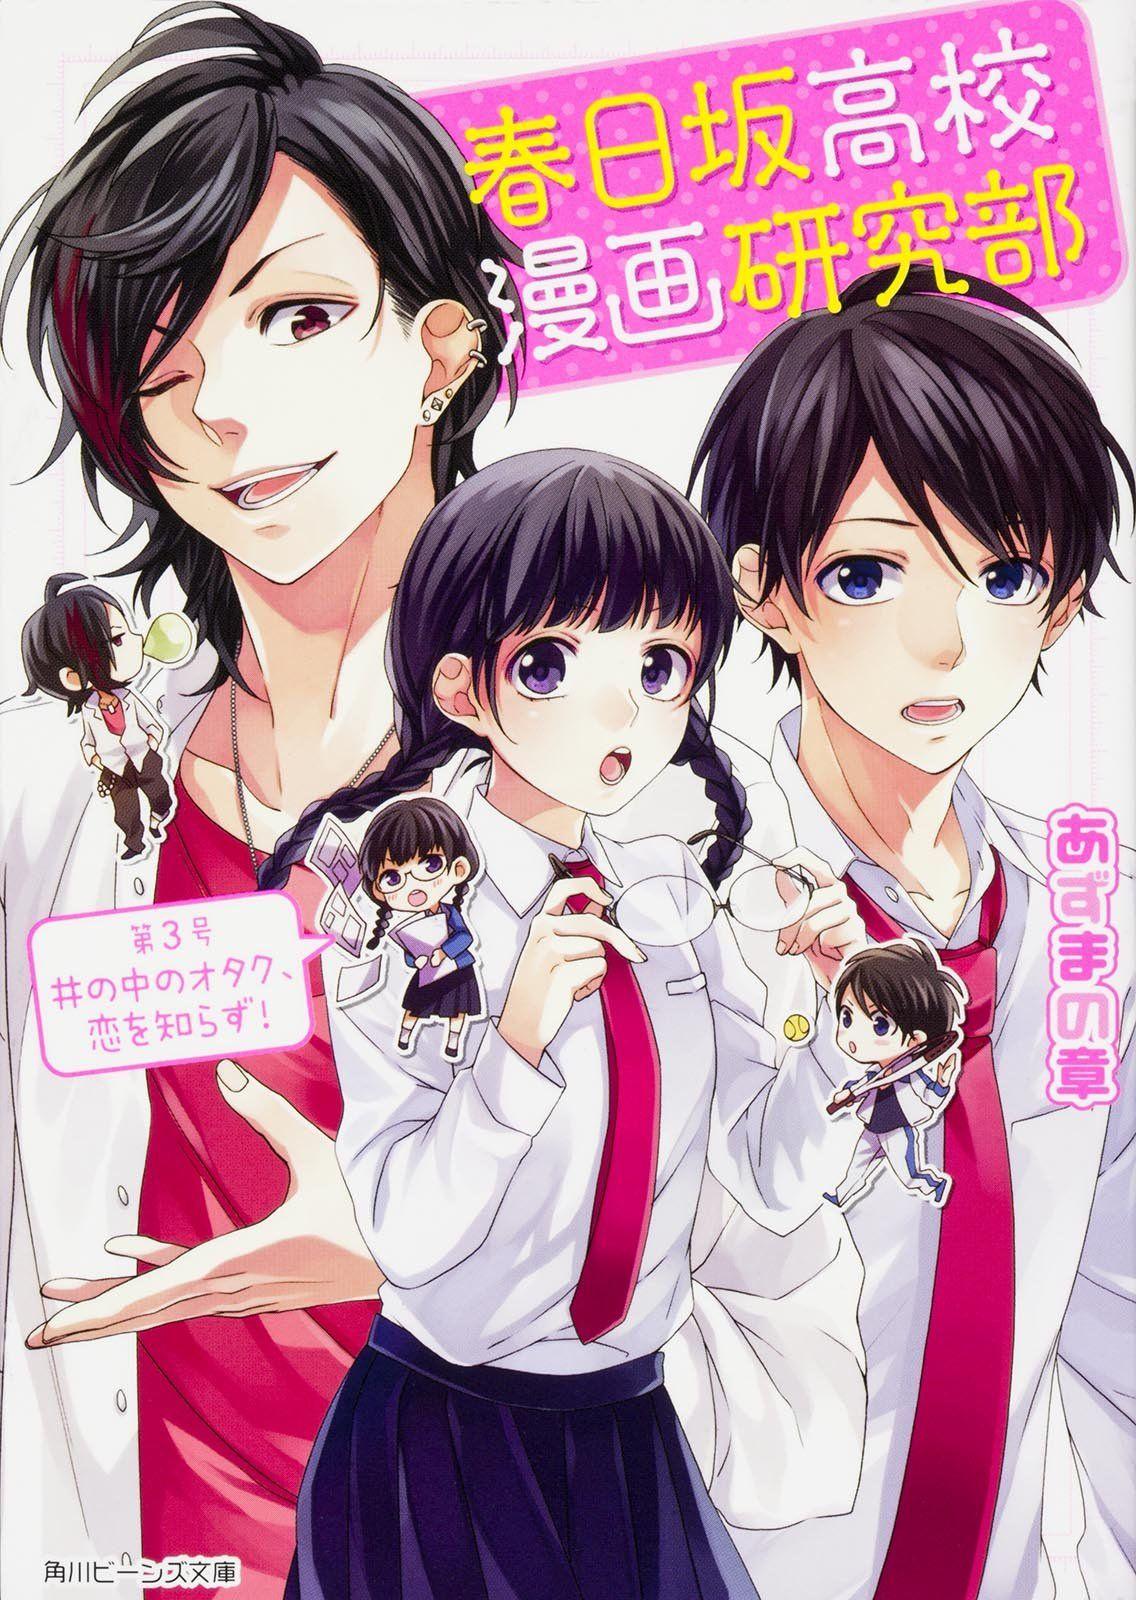 Pin by Animetale on couples Anime, Anime love, Manga